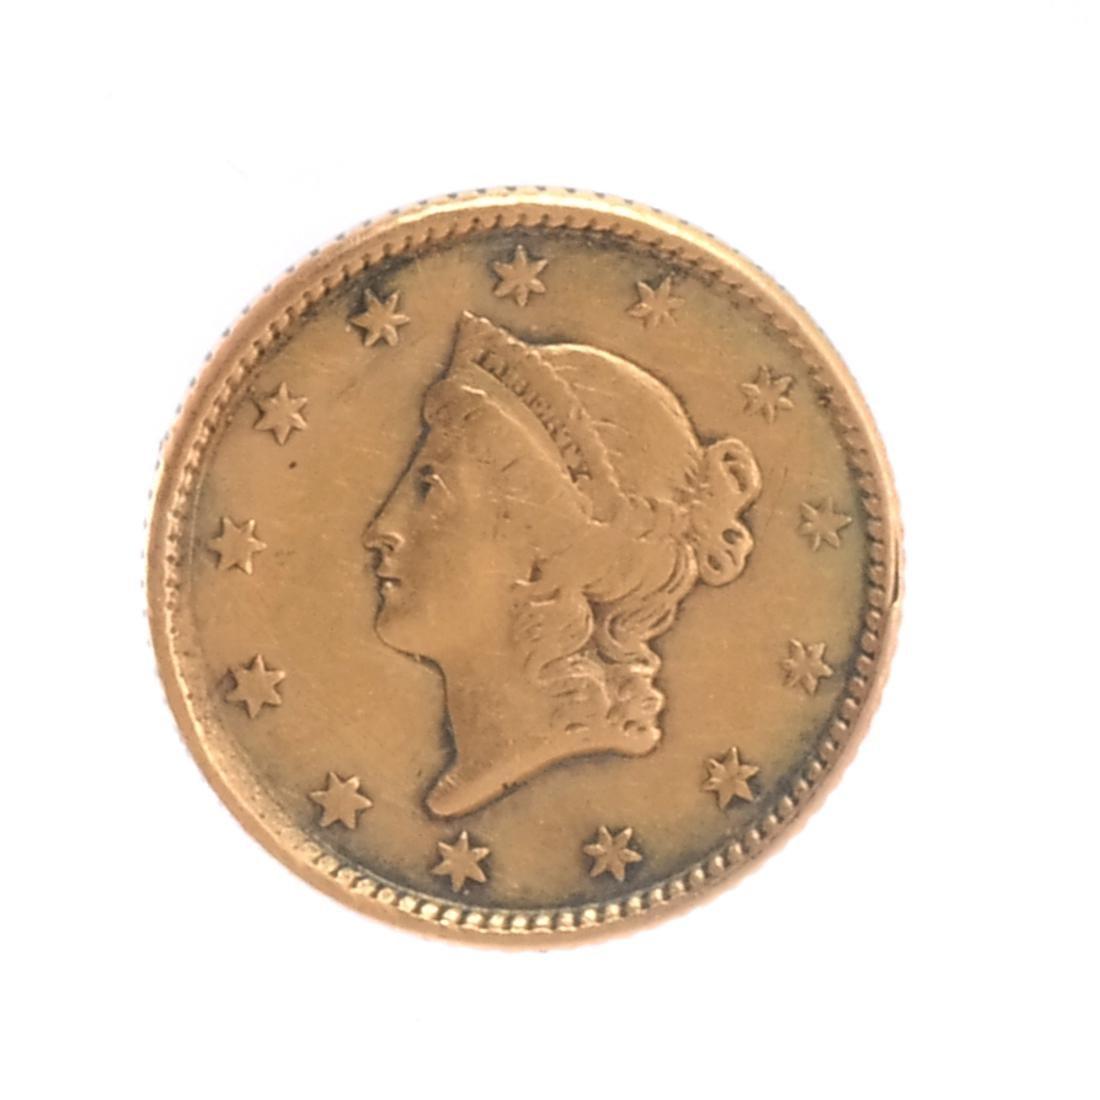 1851 $1 Gold Liberty Head Coin VF